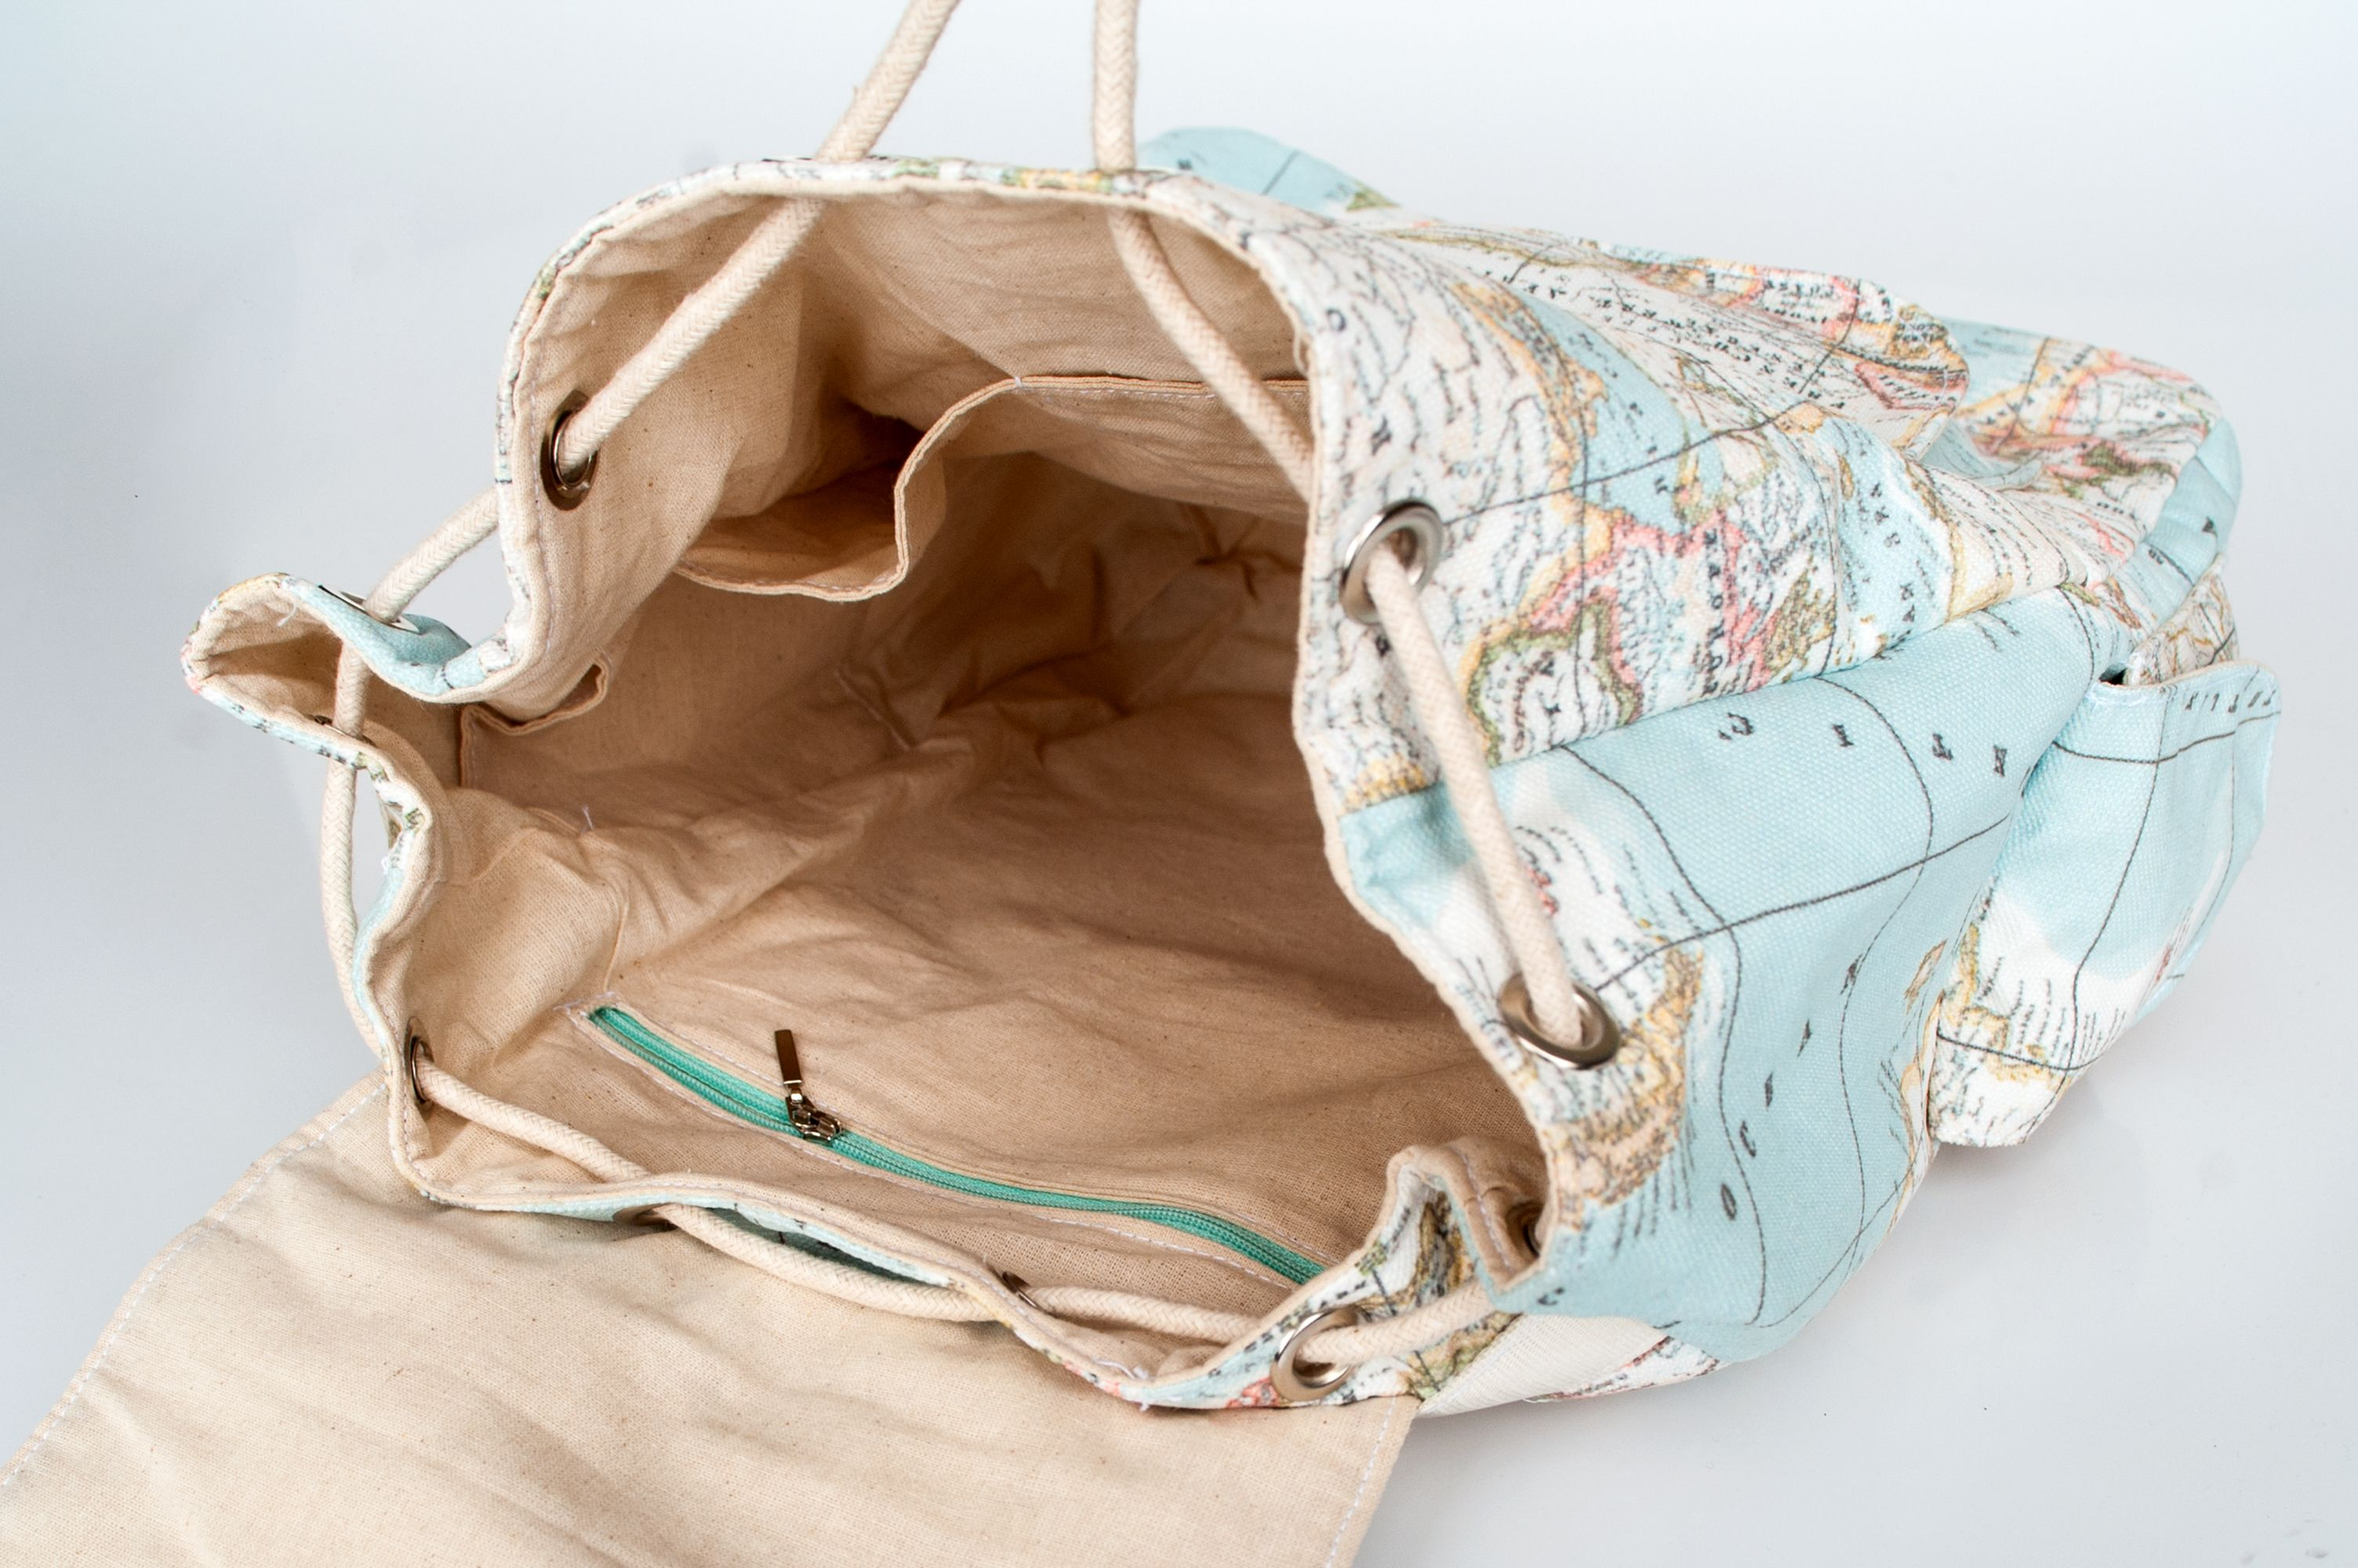 shop weltenbummler rucksack als geschenk oder f r eure eigene n chste reise so oder so. Black Bedroom Furniture Sets. Home Design Ideas